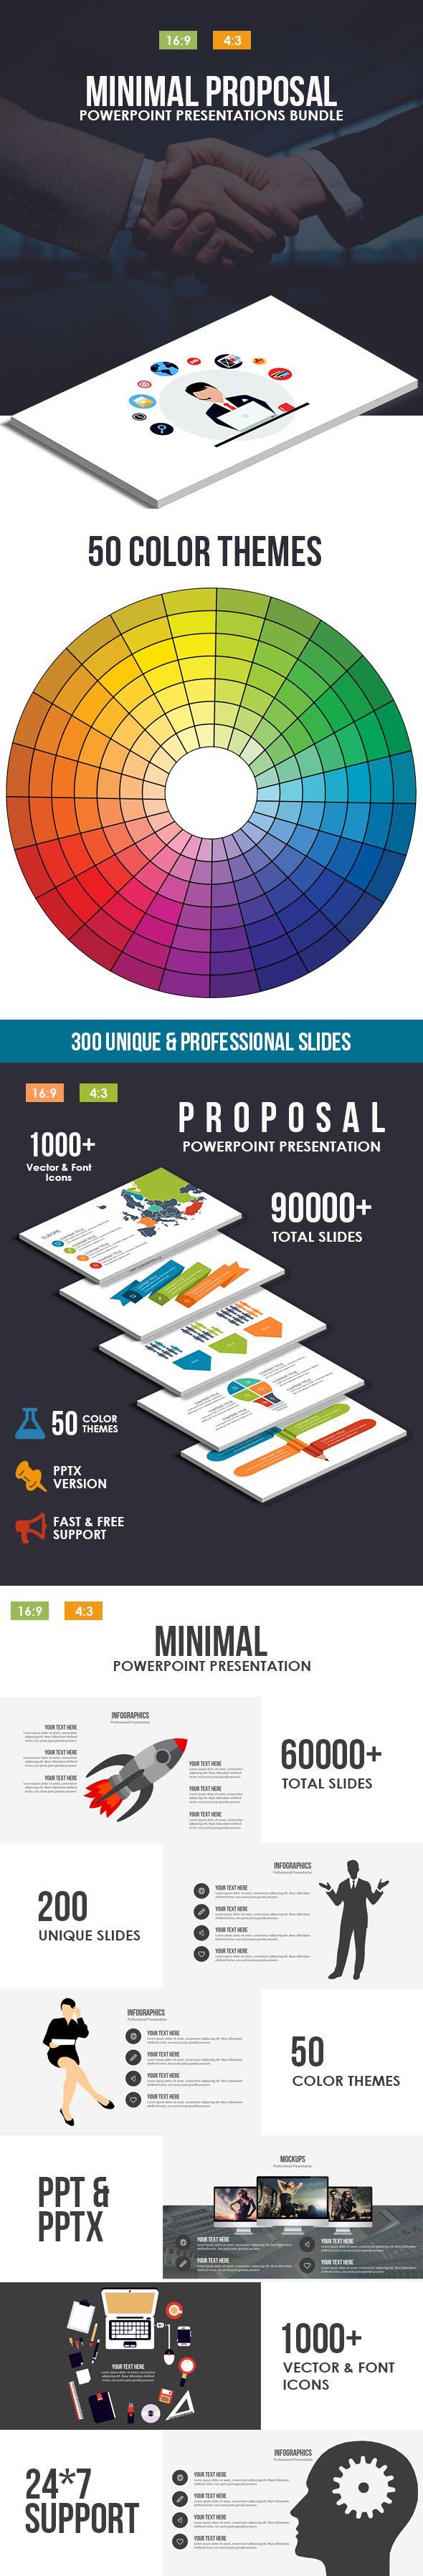 Minimal Proposal Powerpoint Template Bundle